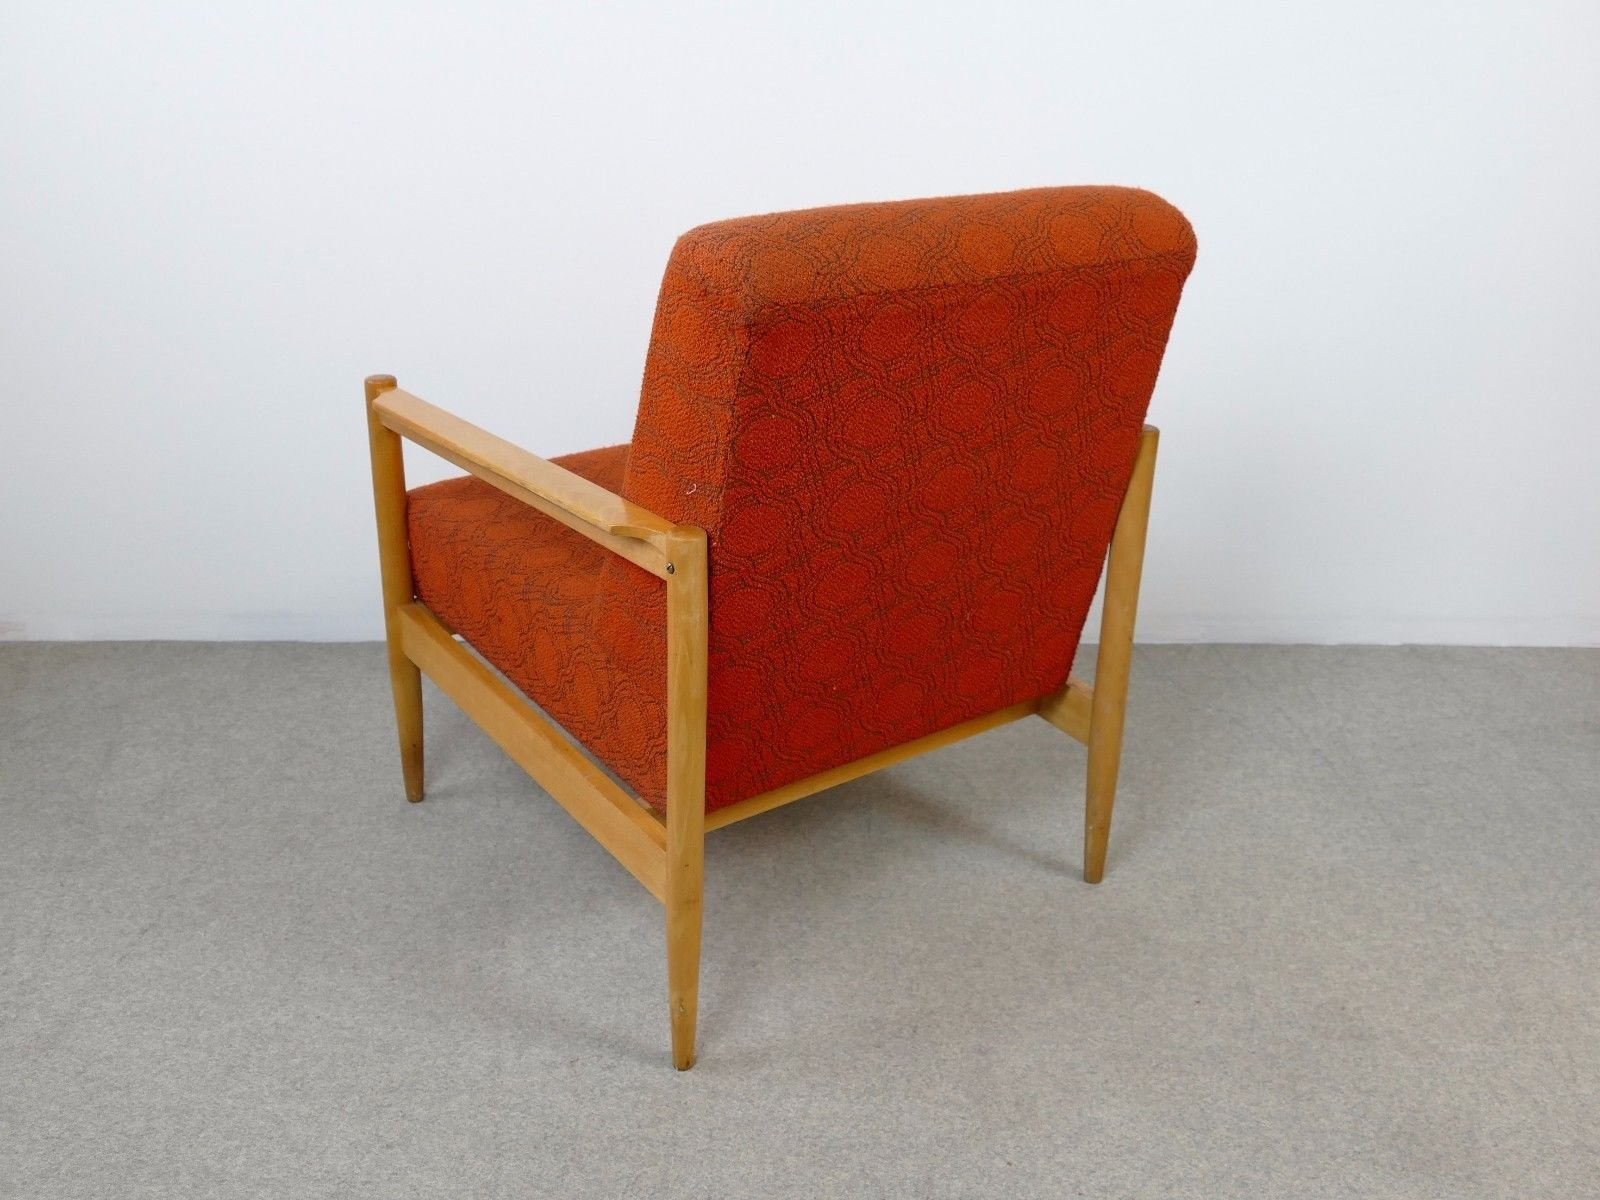 oranger mid century sessel 1960er bei pamono kaufen. Black Bedroom Furniture Sets. Home Design Ideas